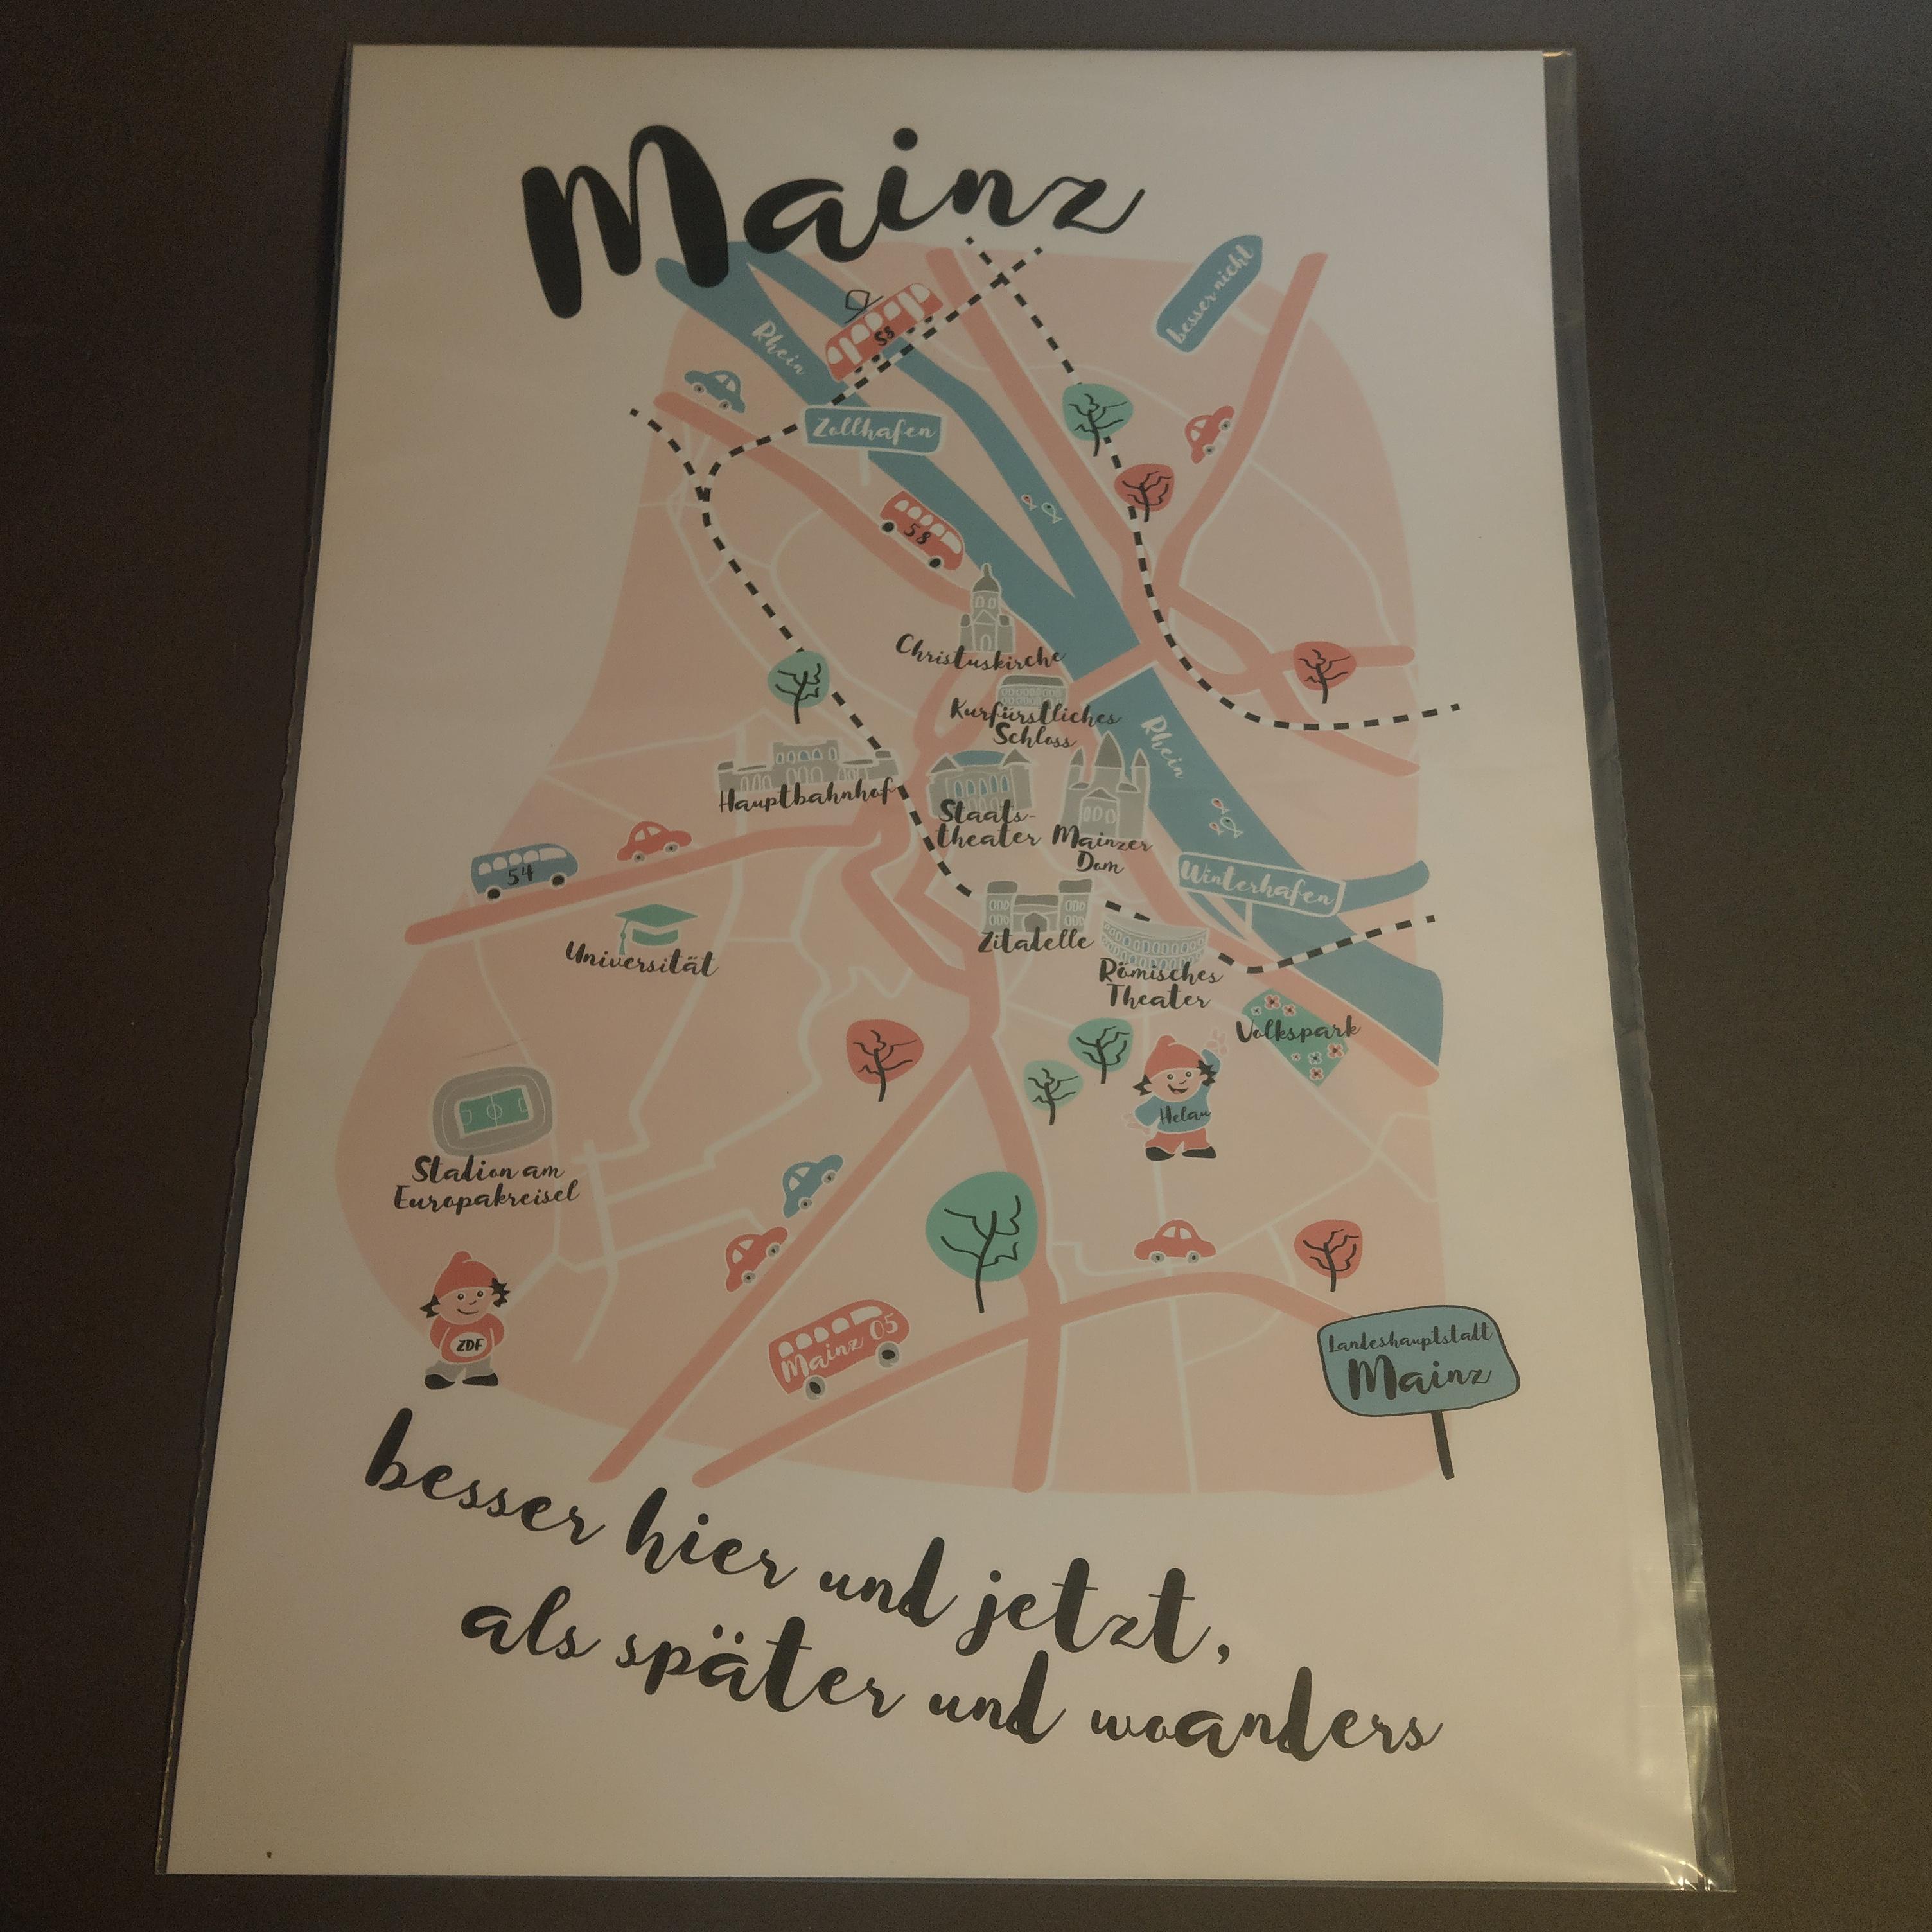 Mainz-Stadtplan von Kira Ermshaus